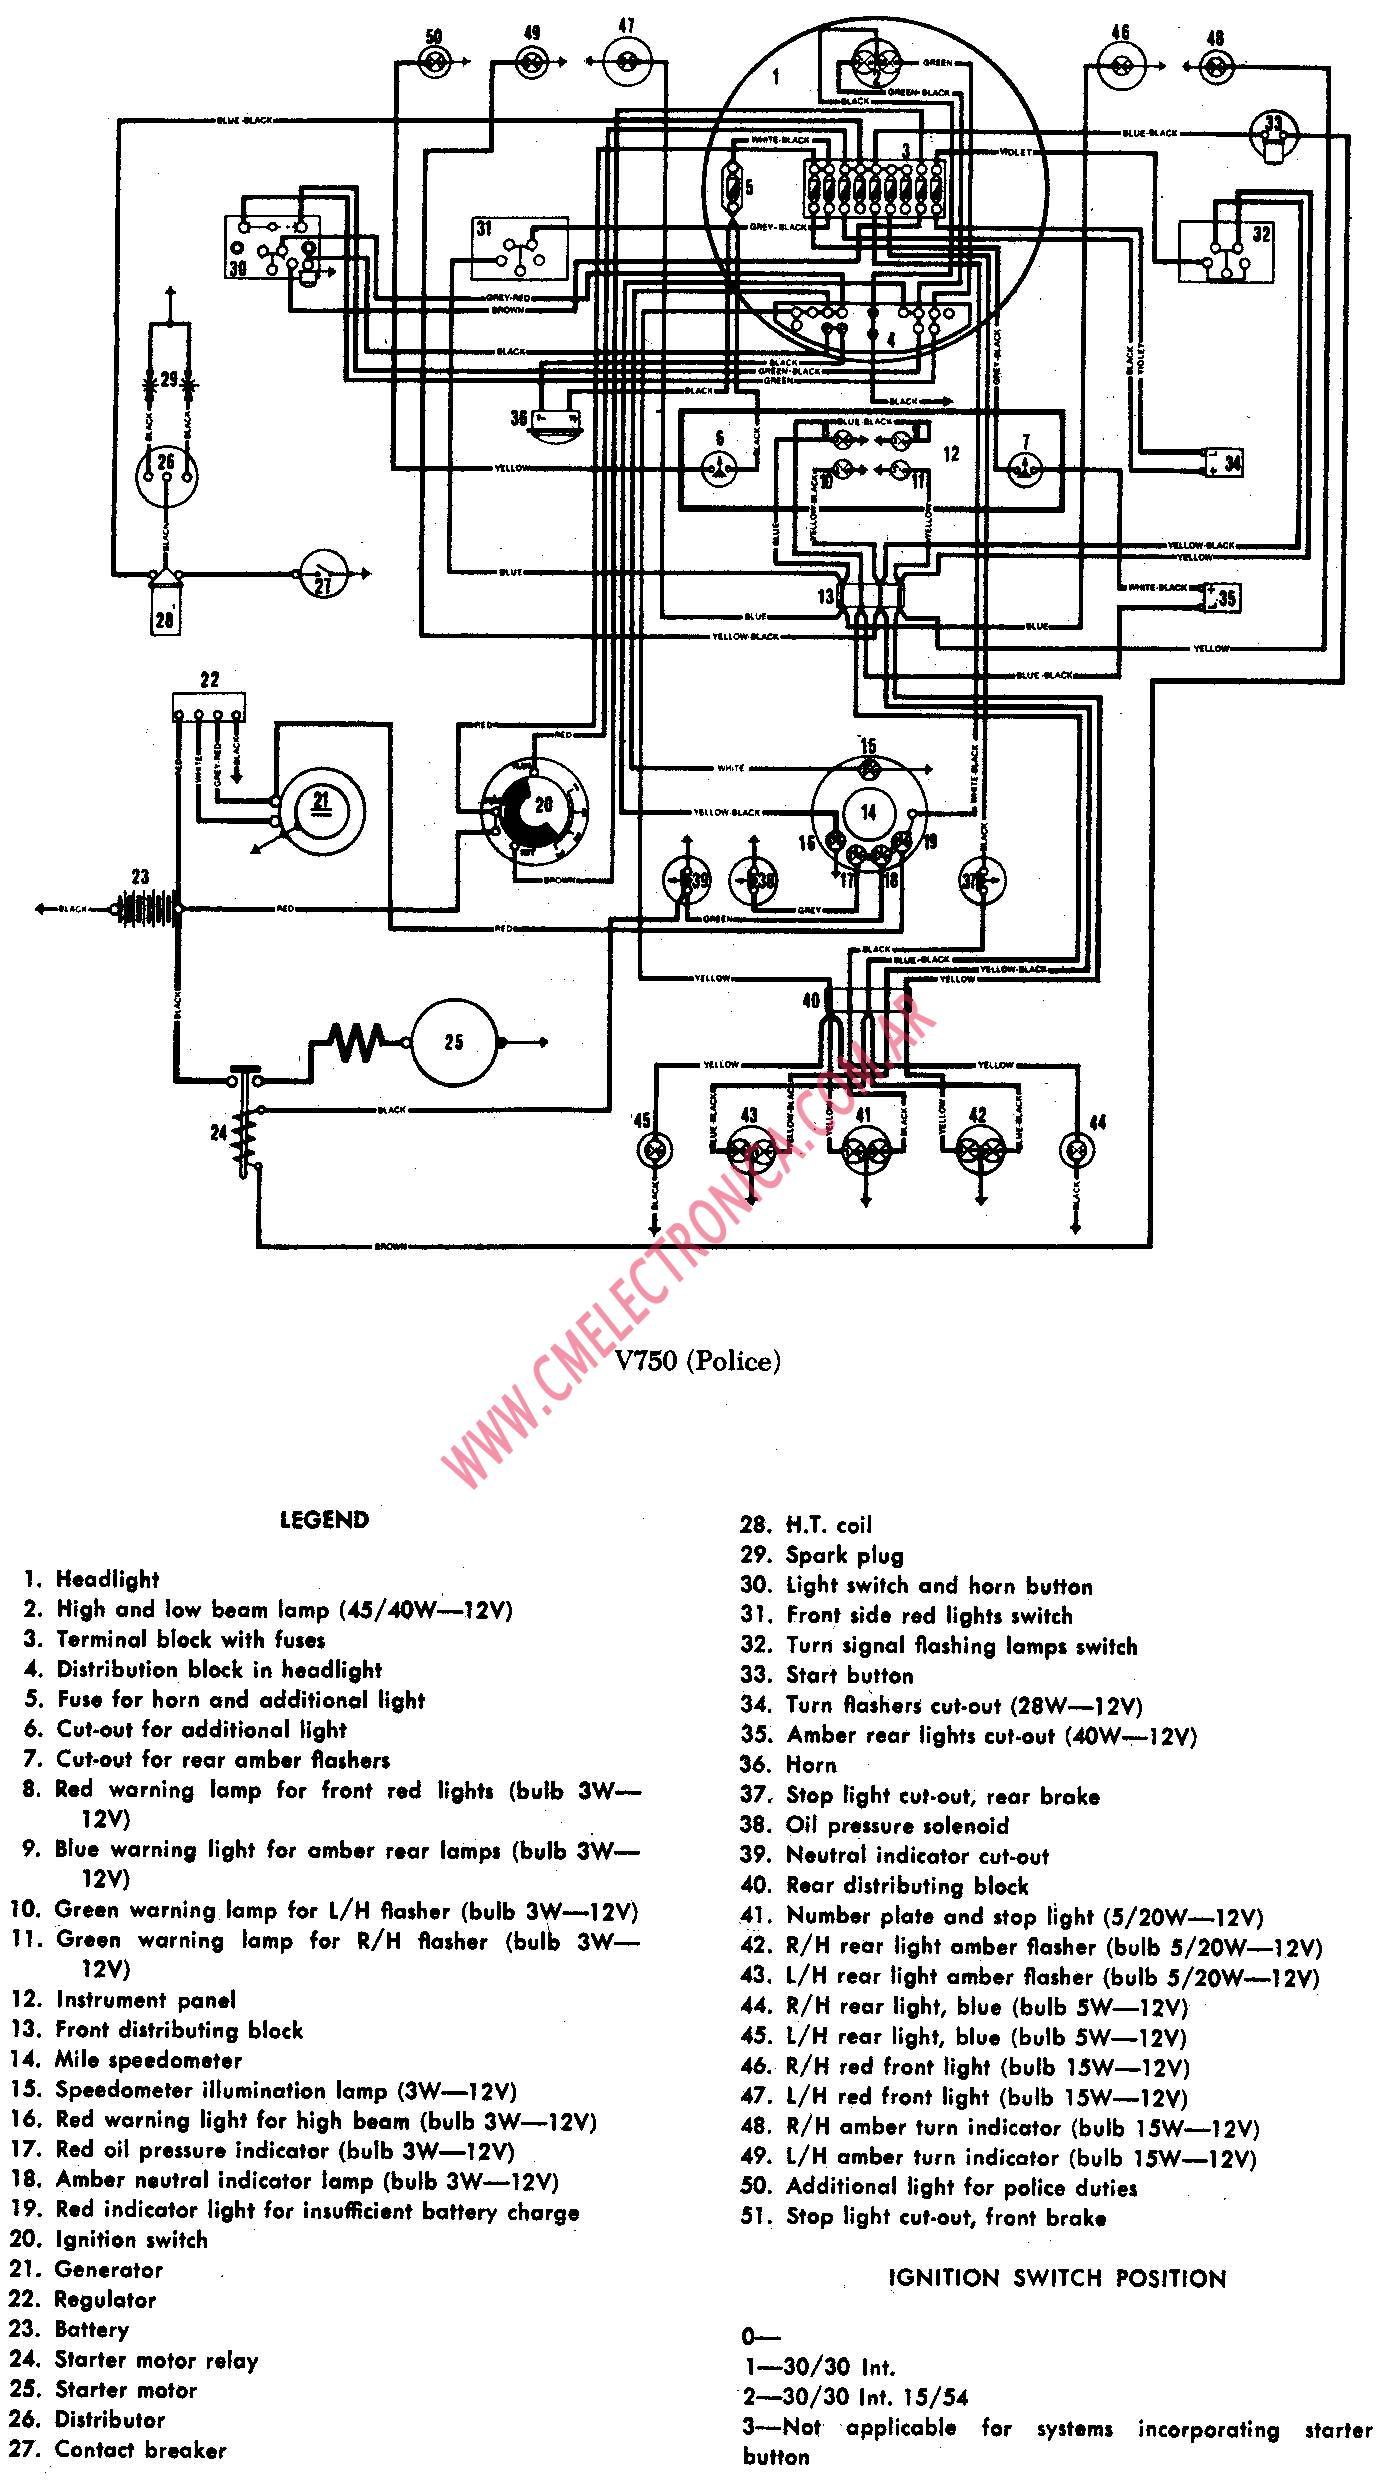 Zx7r Wiring Diagram 2006 Manco Intruder II Wire Diagram